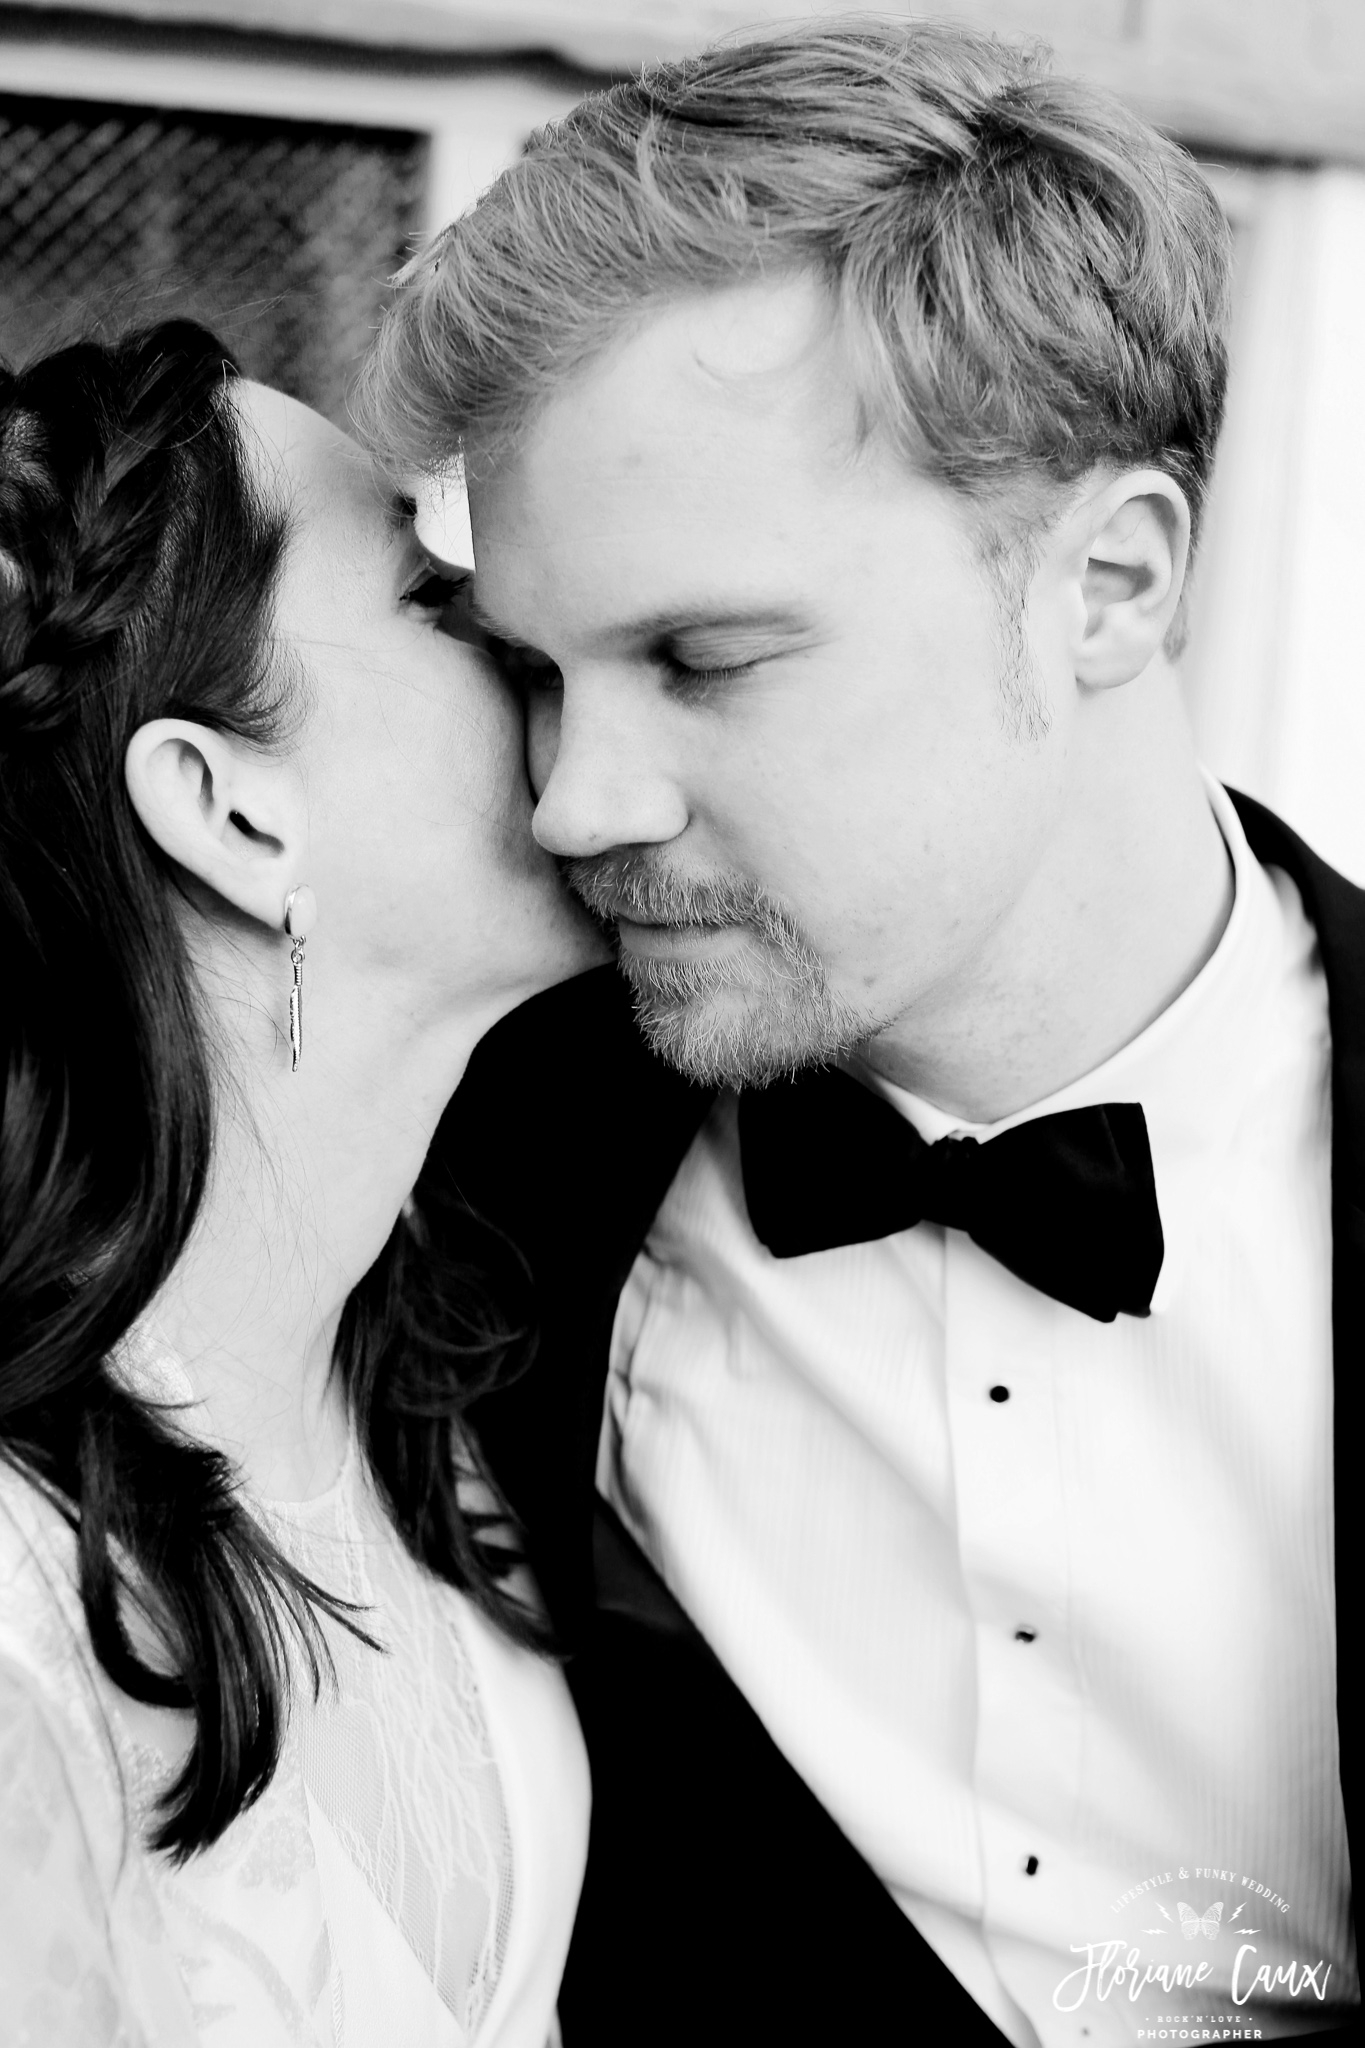 destination-wedding-photographer-oslo-norway-floriane-caux-15